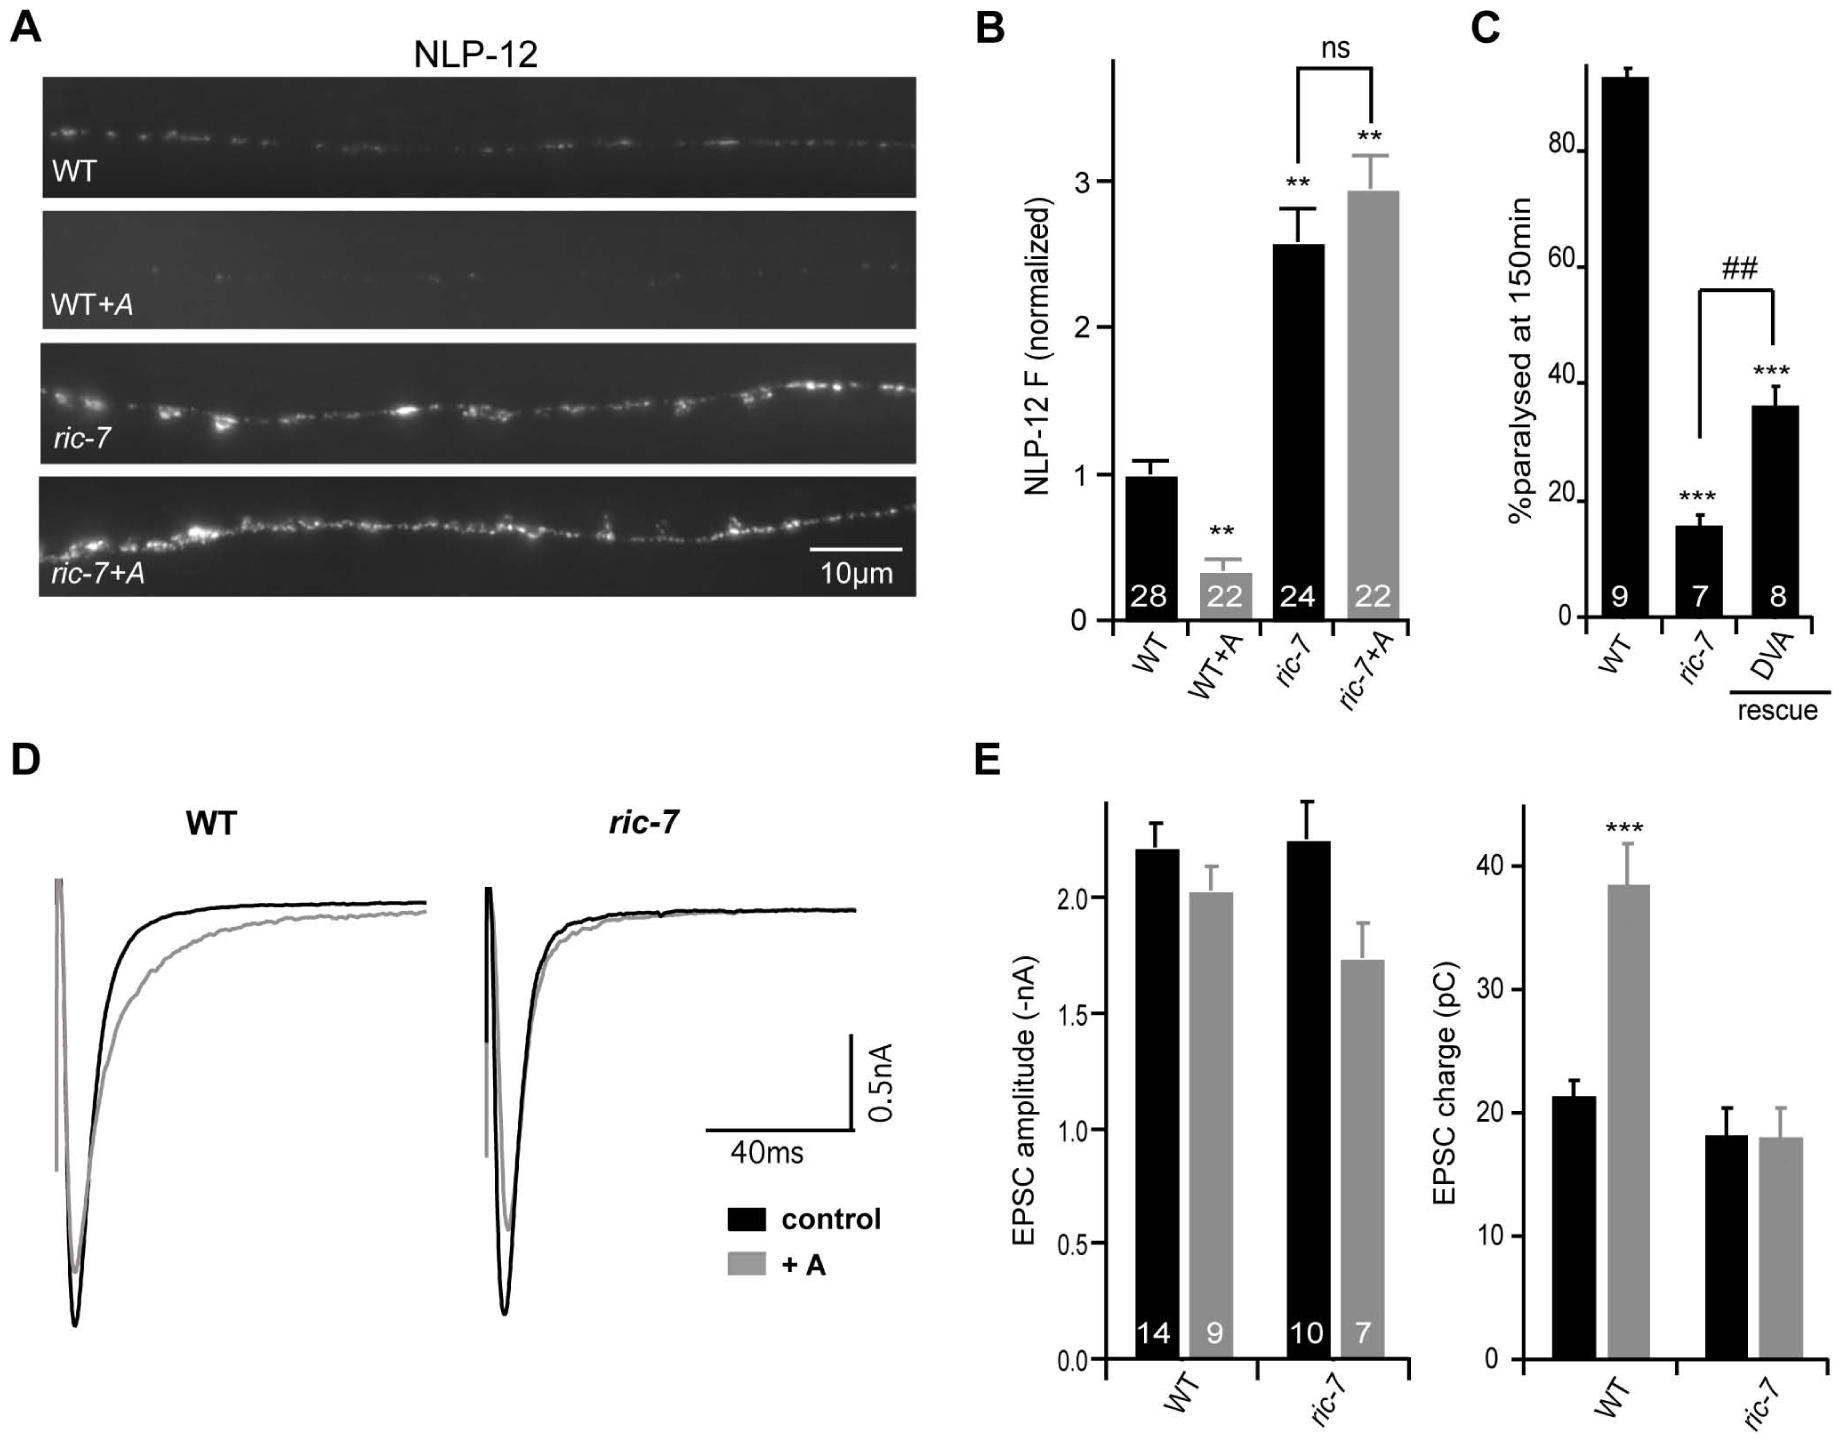 NLP-12 secretion is decreased in <i>ric-7</i> mutants.